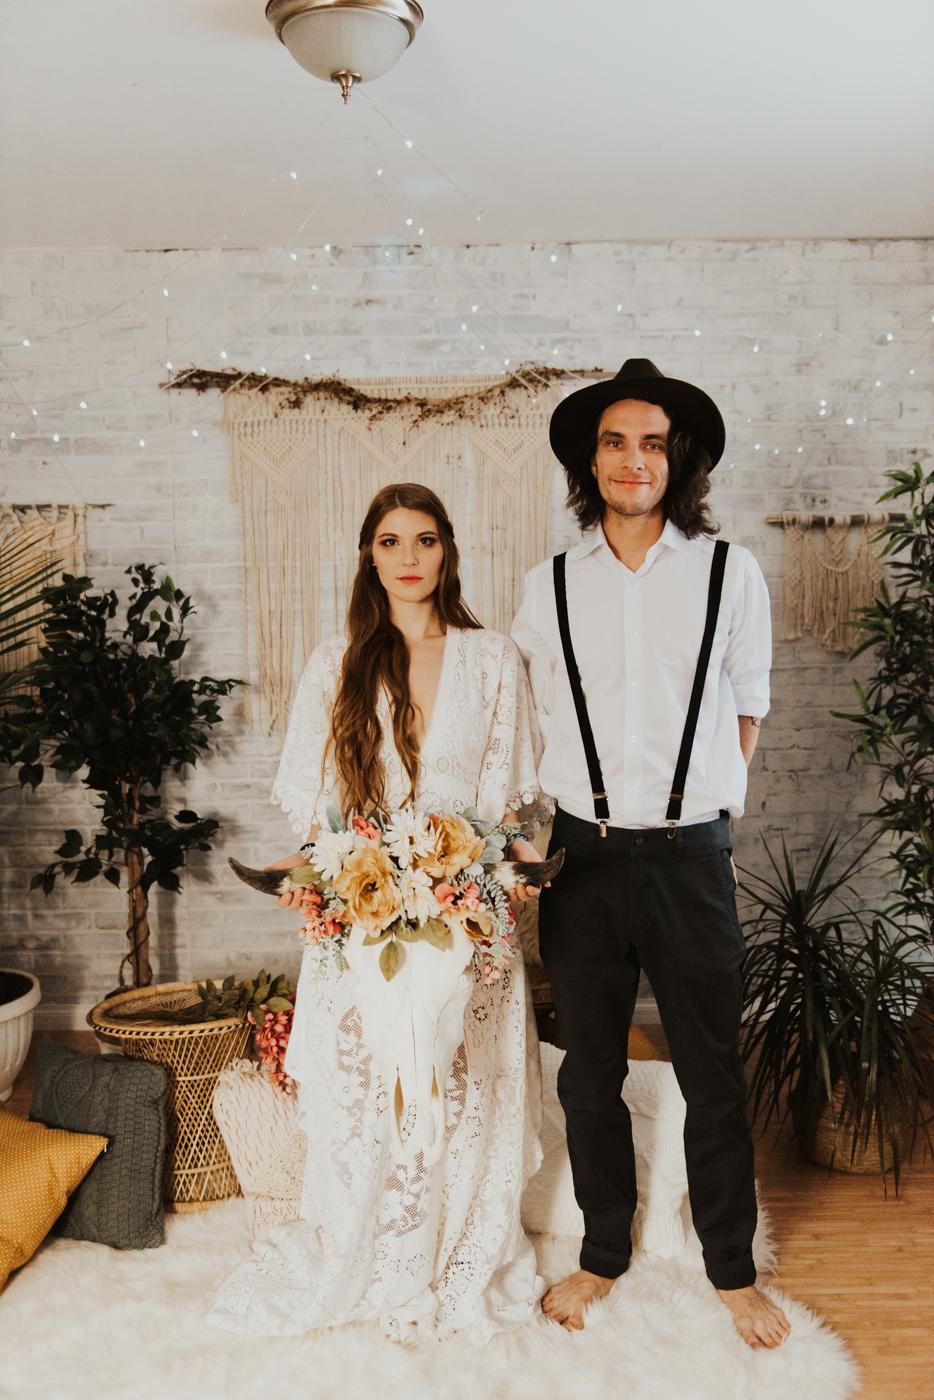 FortSt.John_photographer_TyraEPhotography_Wedding_Couple_Family_Photograhy_DawsonCreek_Elopement_Bride_Boduoir_Portraits-4739.jpg